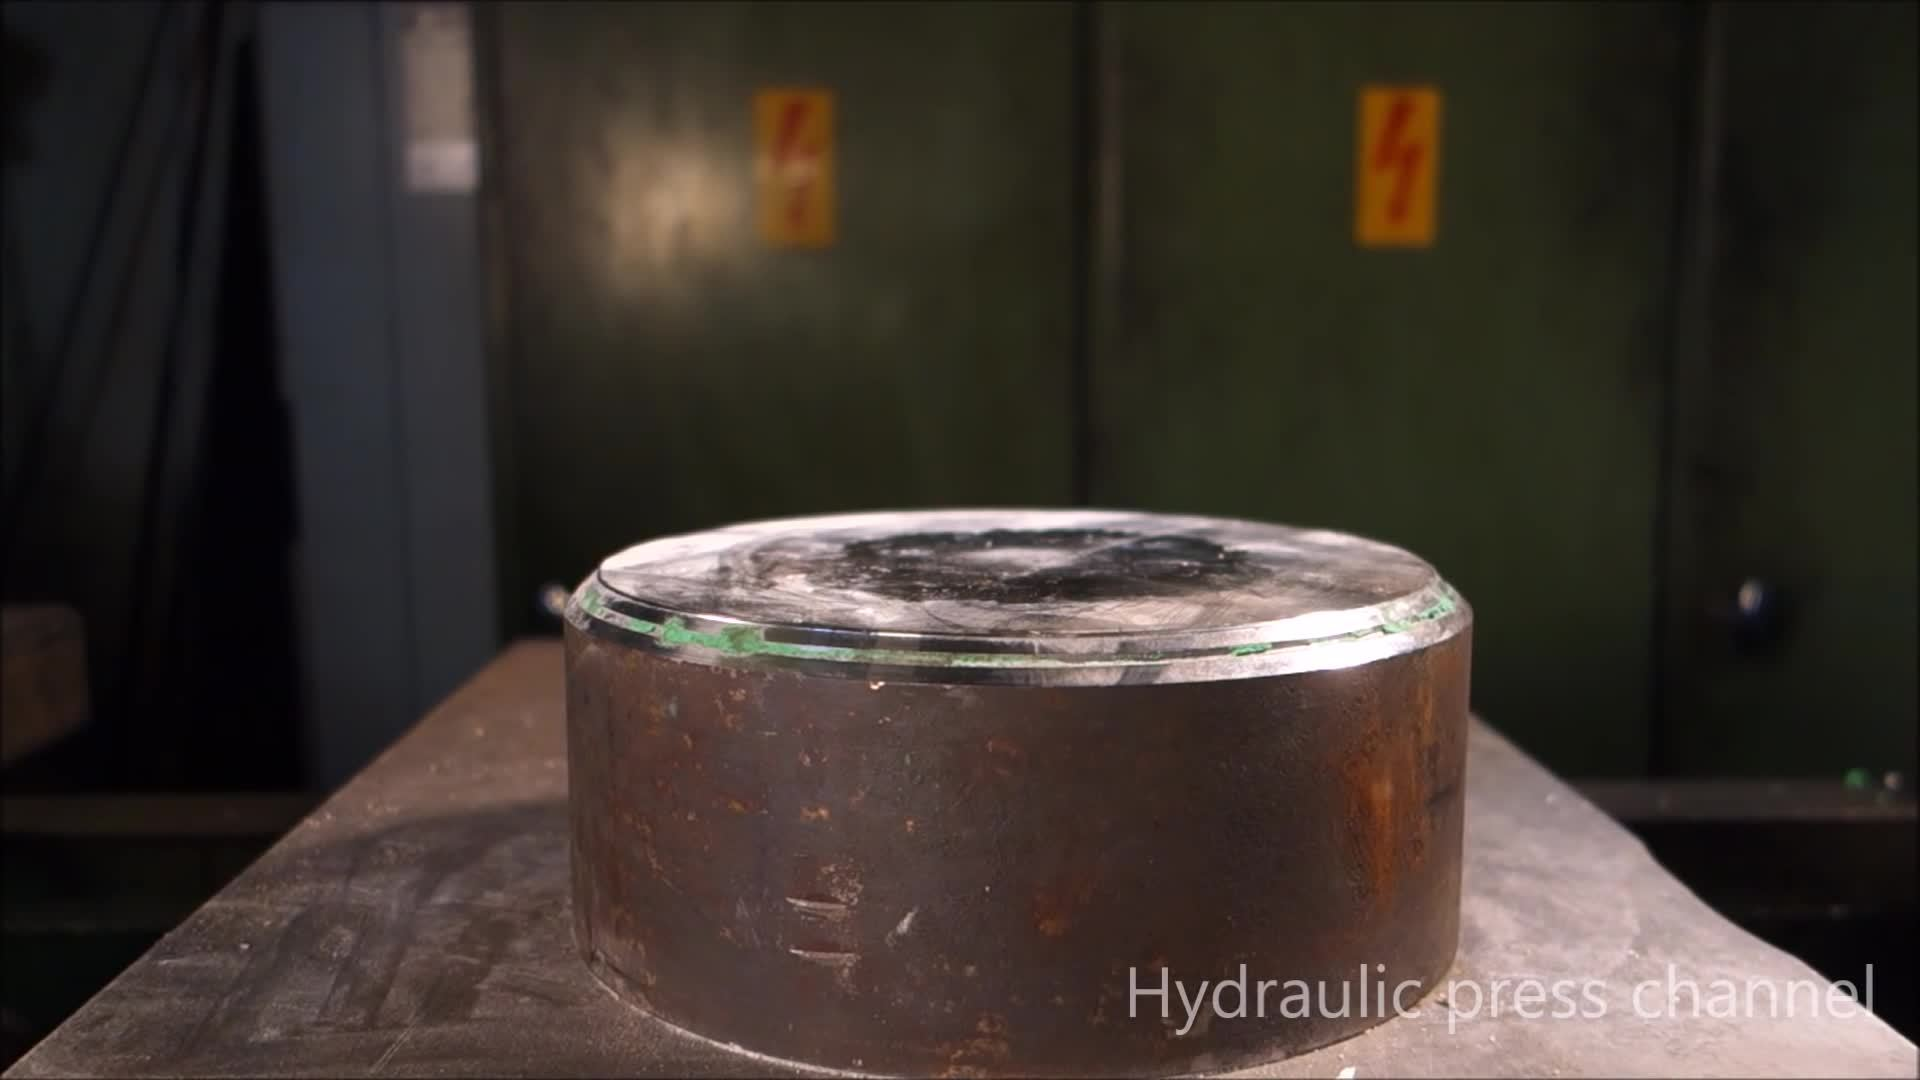 hydraulic press channel, hydraulicpresschannel, me_irl, me irl GIFs